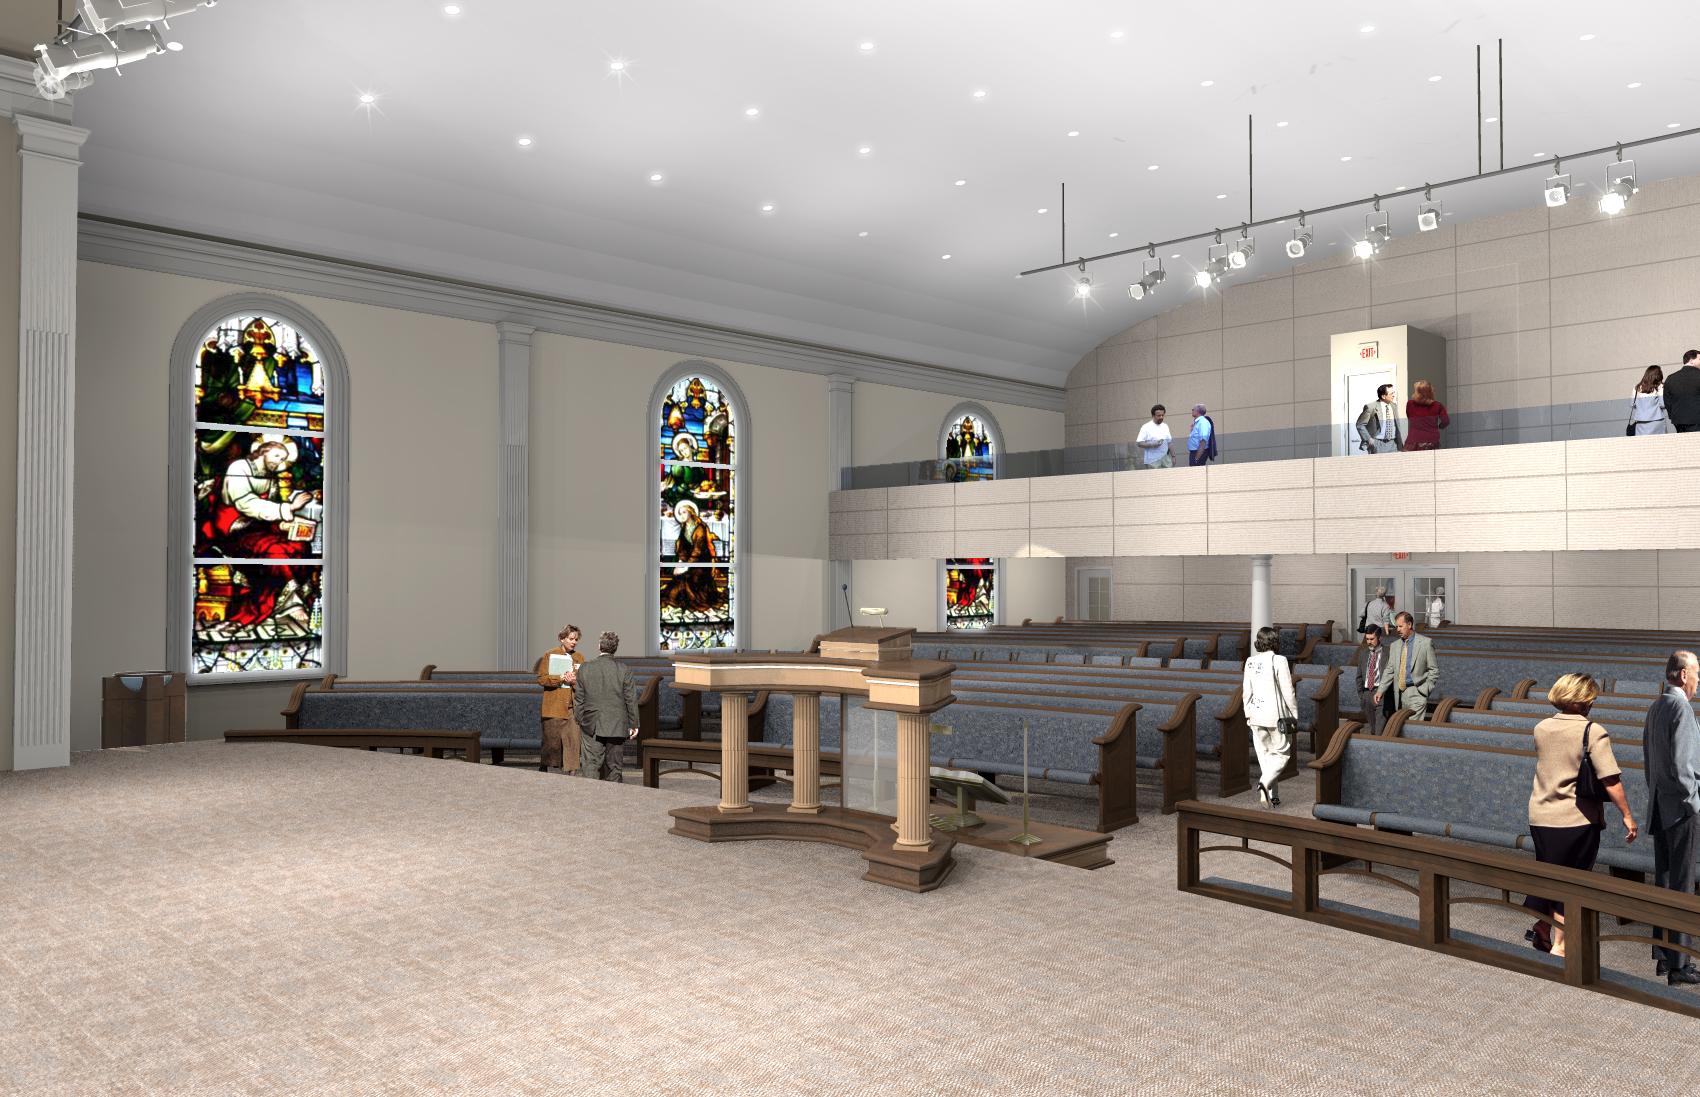 Church-Bear-Perspective-3.jpg